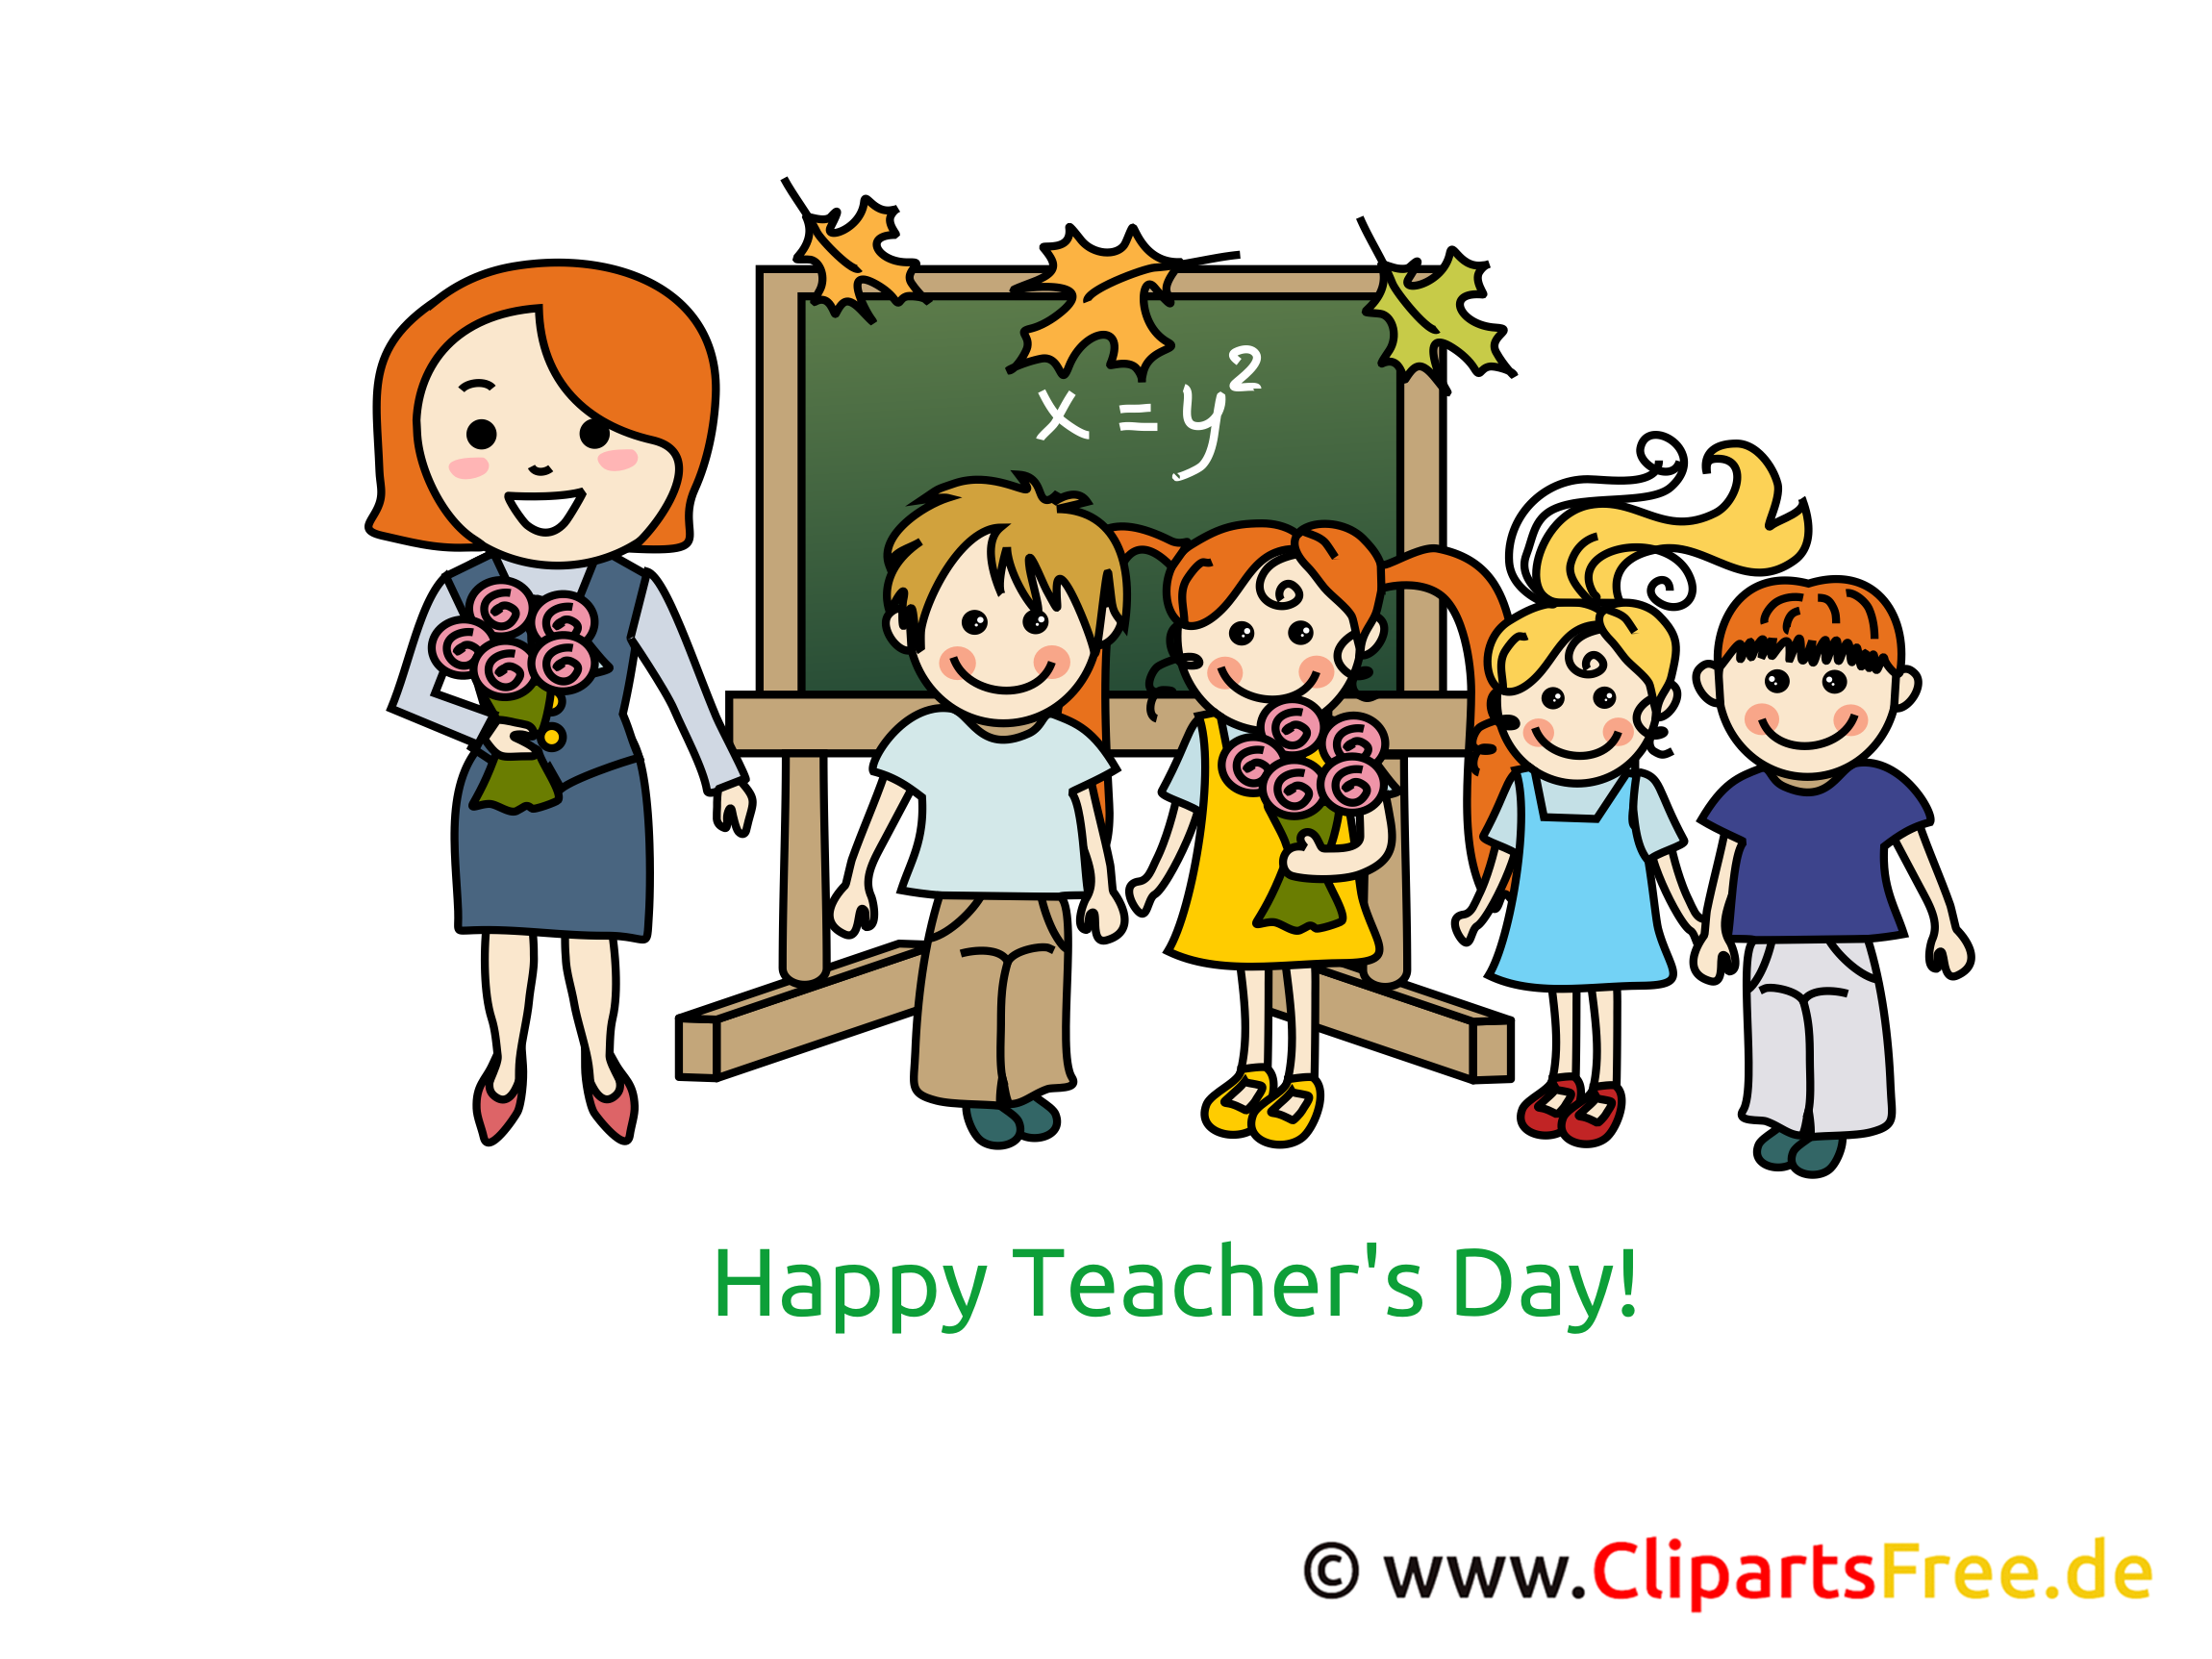 clipart for teachers day - photo #22